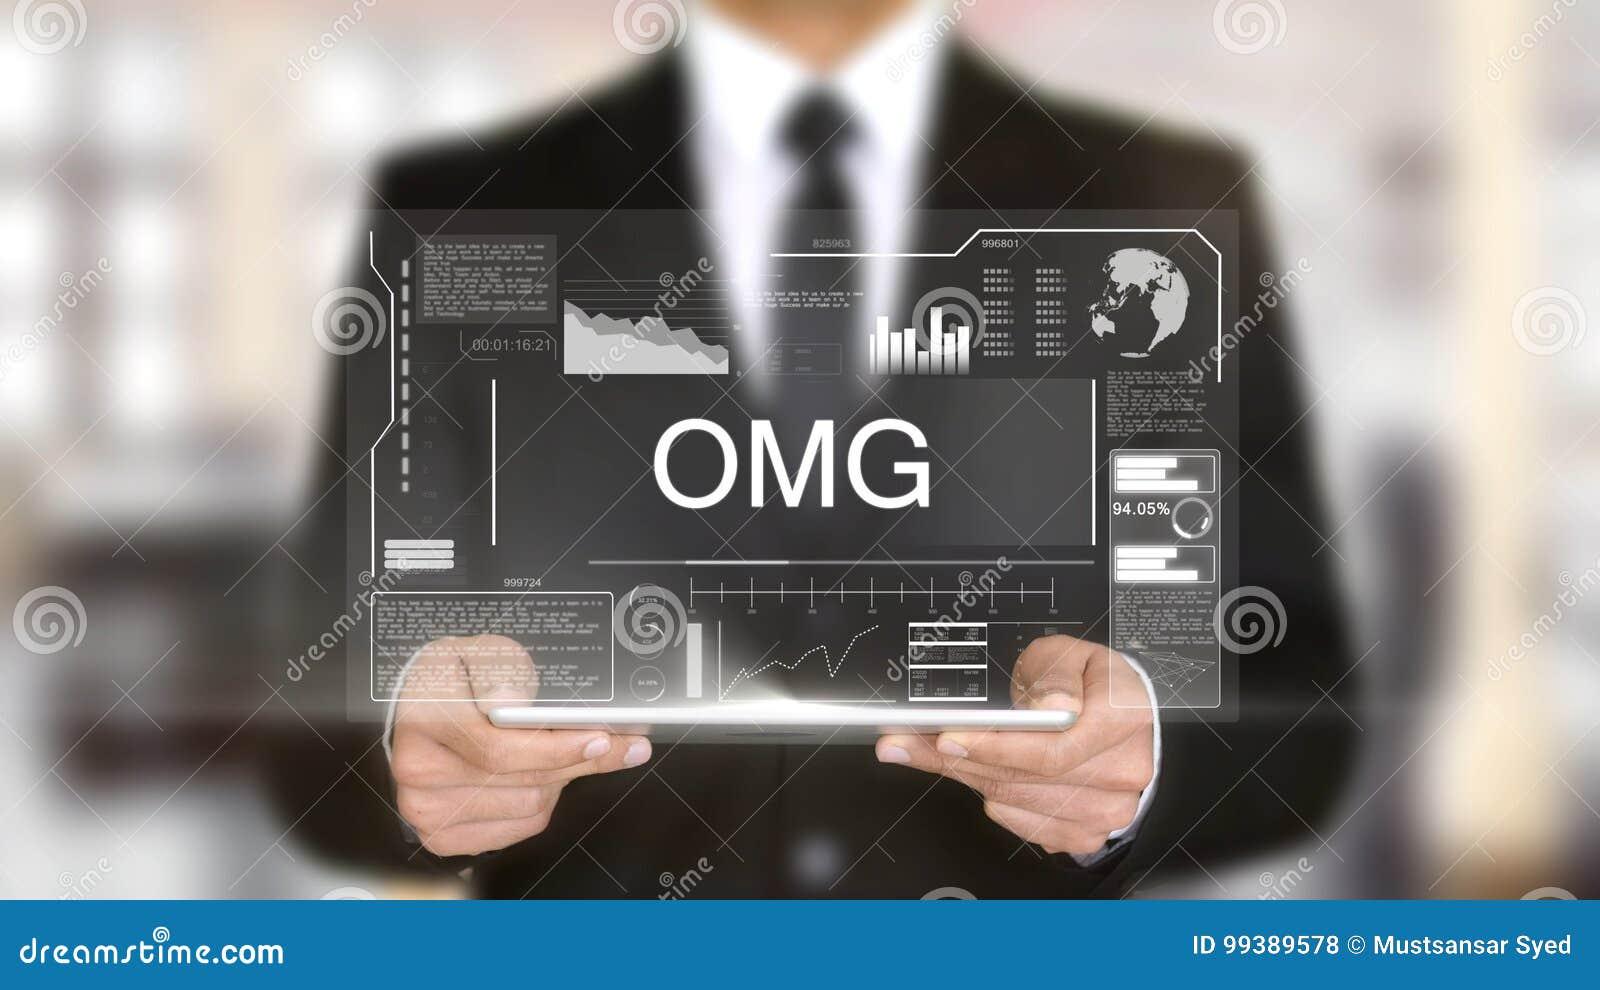 OMG, φουτουριστική διεπαφή ολογραμμάτων, αύξησε την εικονική πραγματικότητα